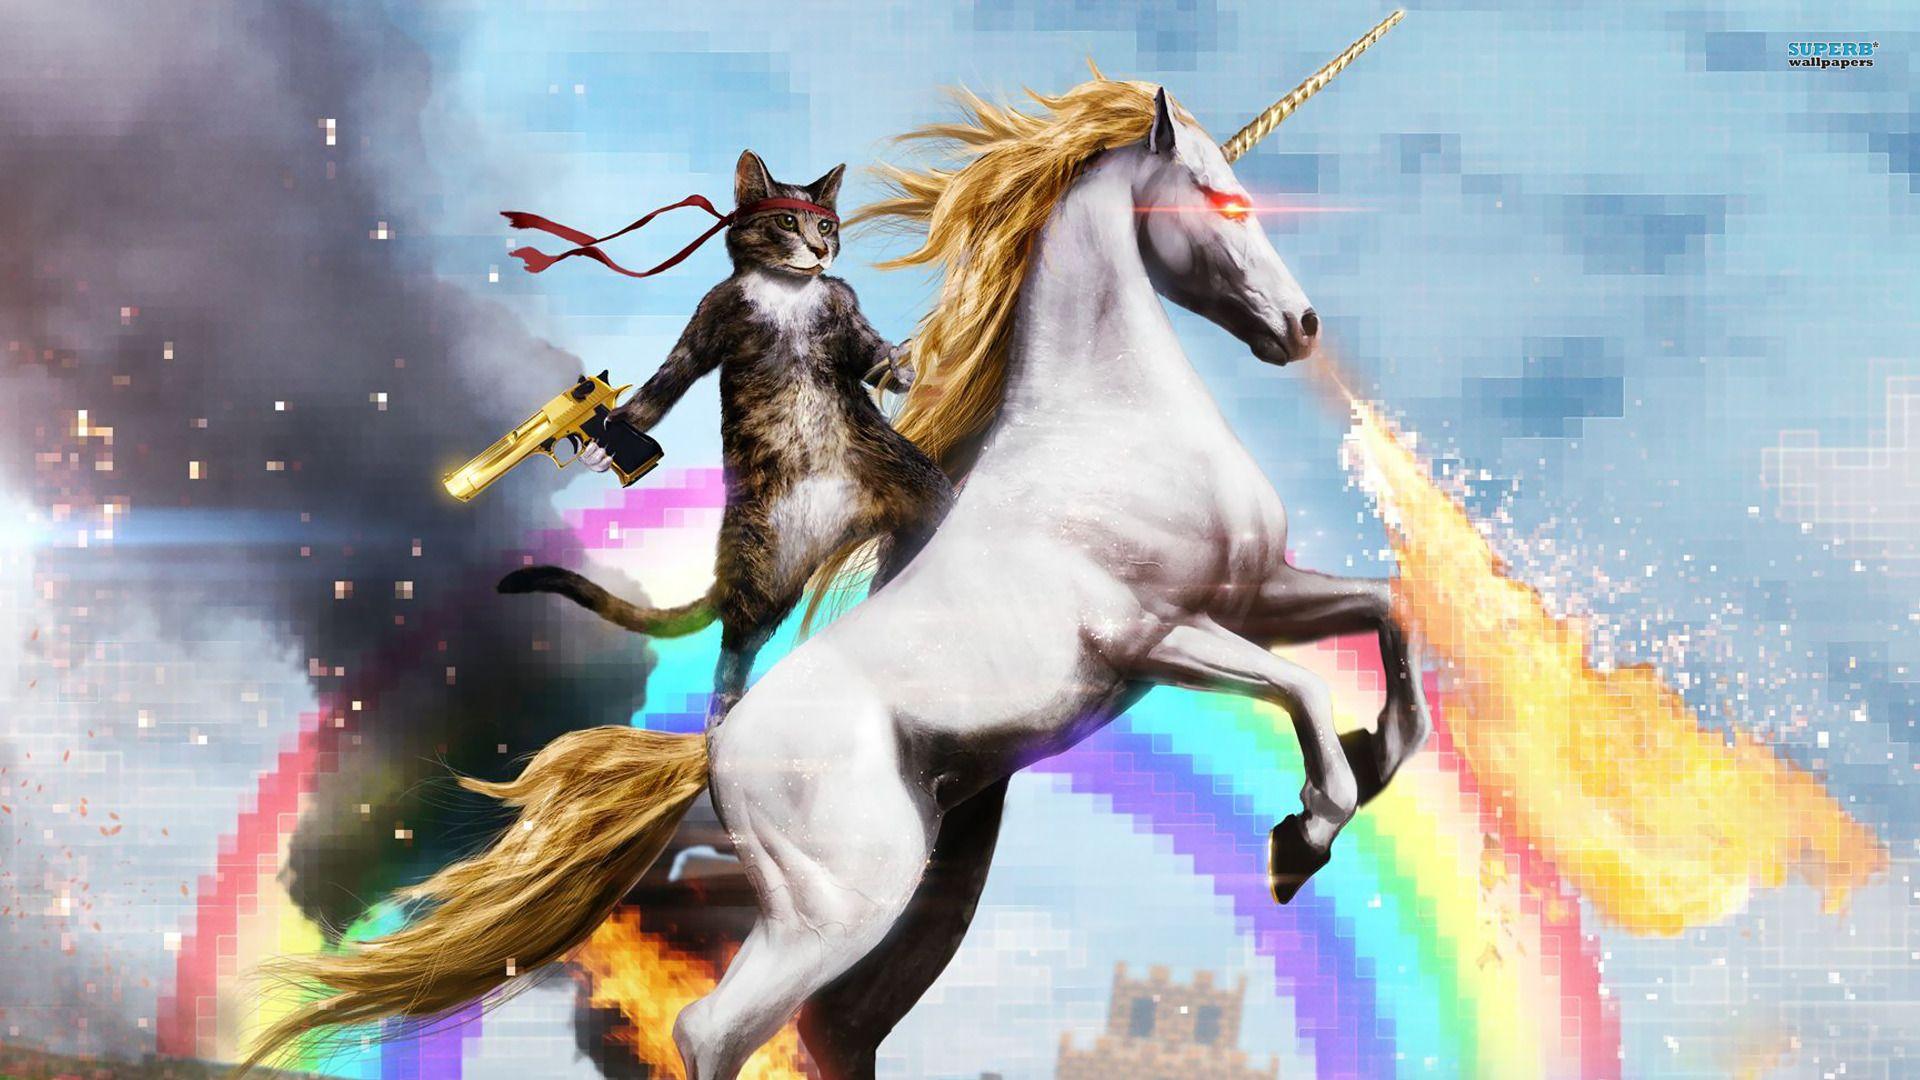 Funny Cat Birthday Meme : Happy birthday thread social imgur community animals and